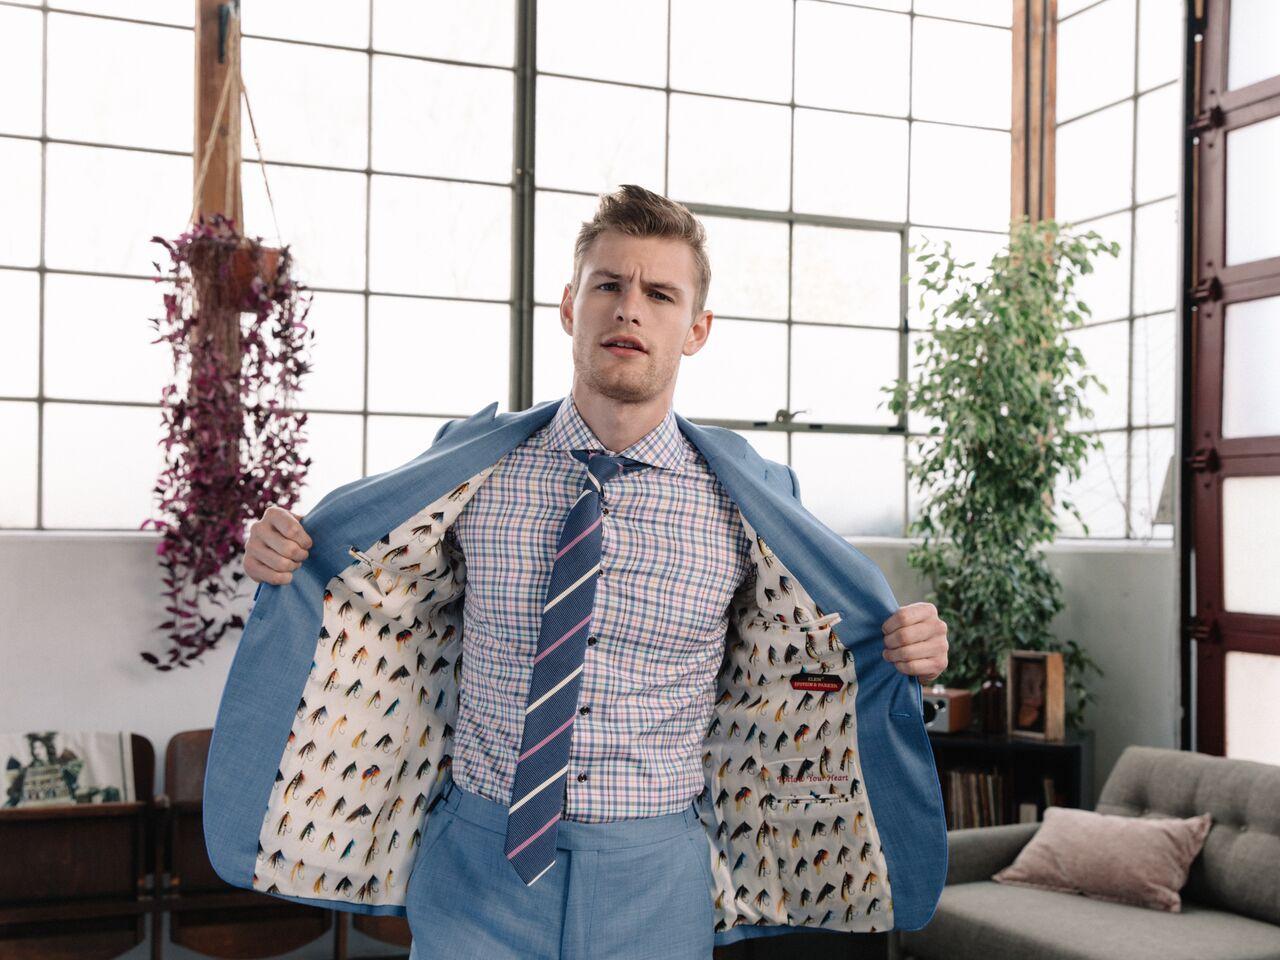 Model - Noah Teicher (LA Models)  Made to Measure Suit. Ready-to-Wear Necktie  Klein Epstein & Parker - Fashion Valley (San Diego)